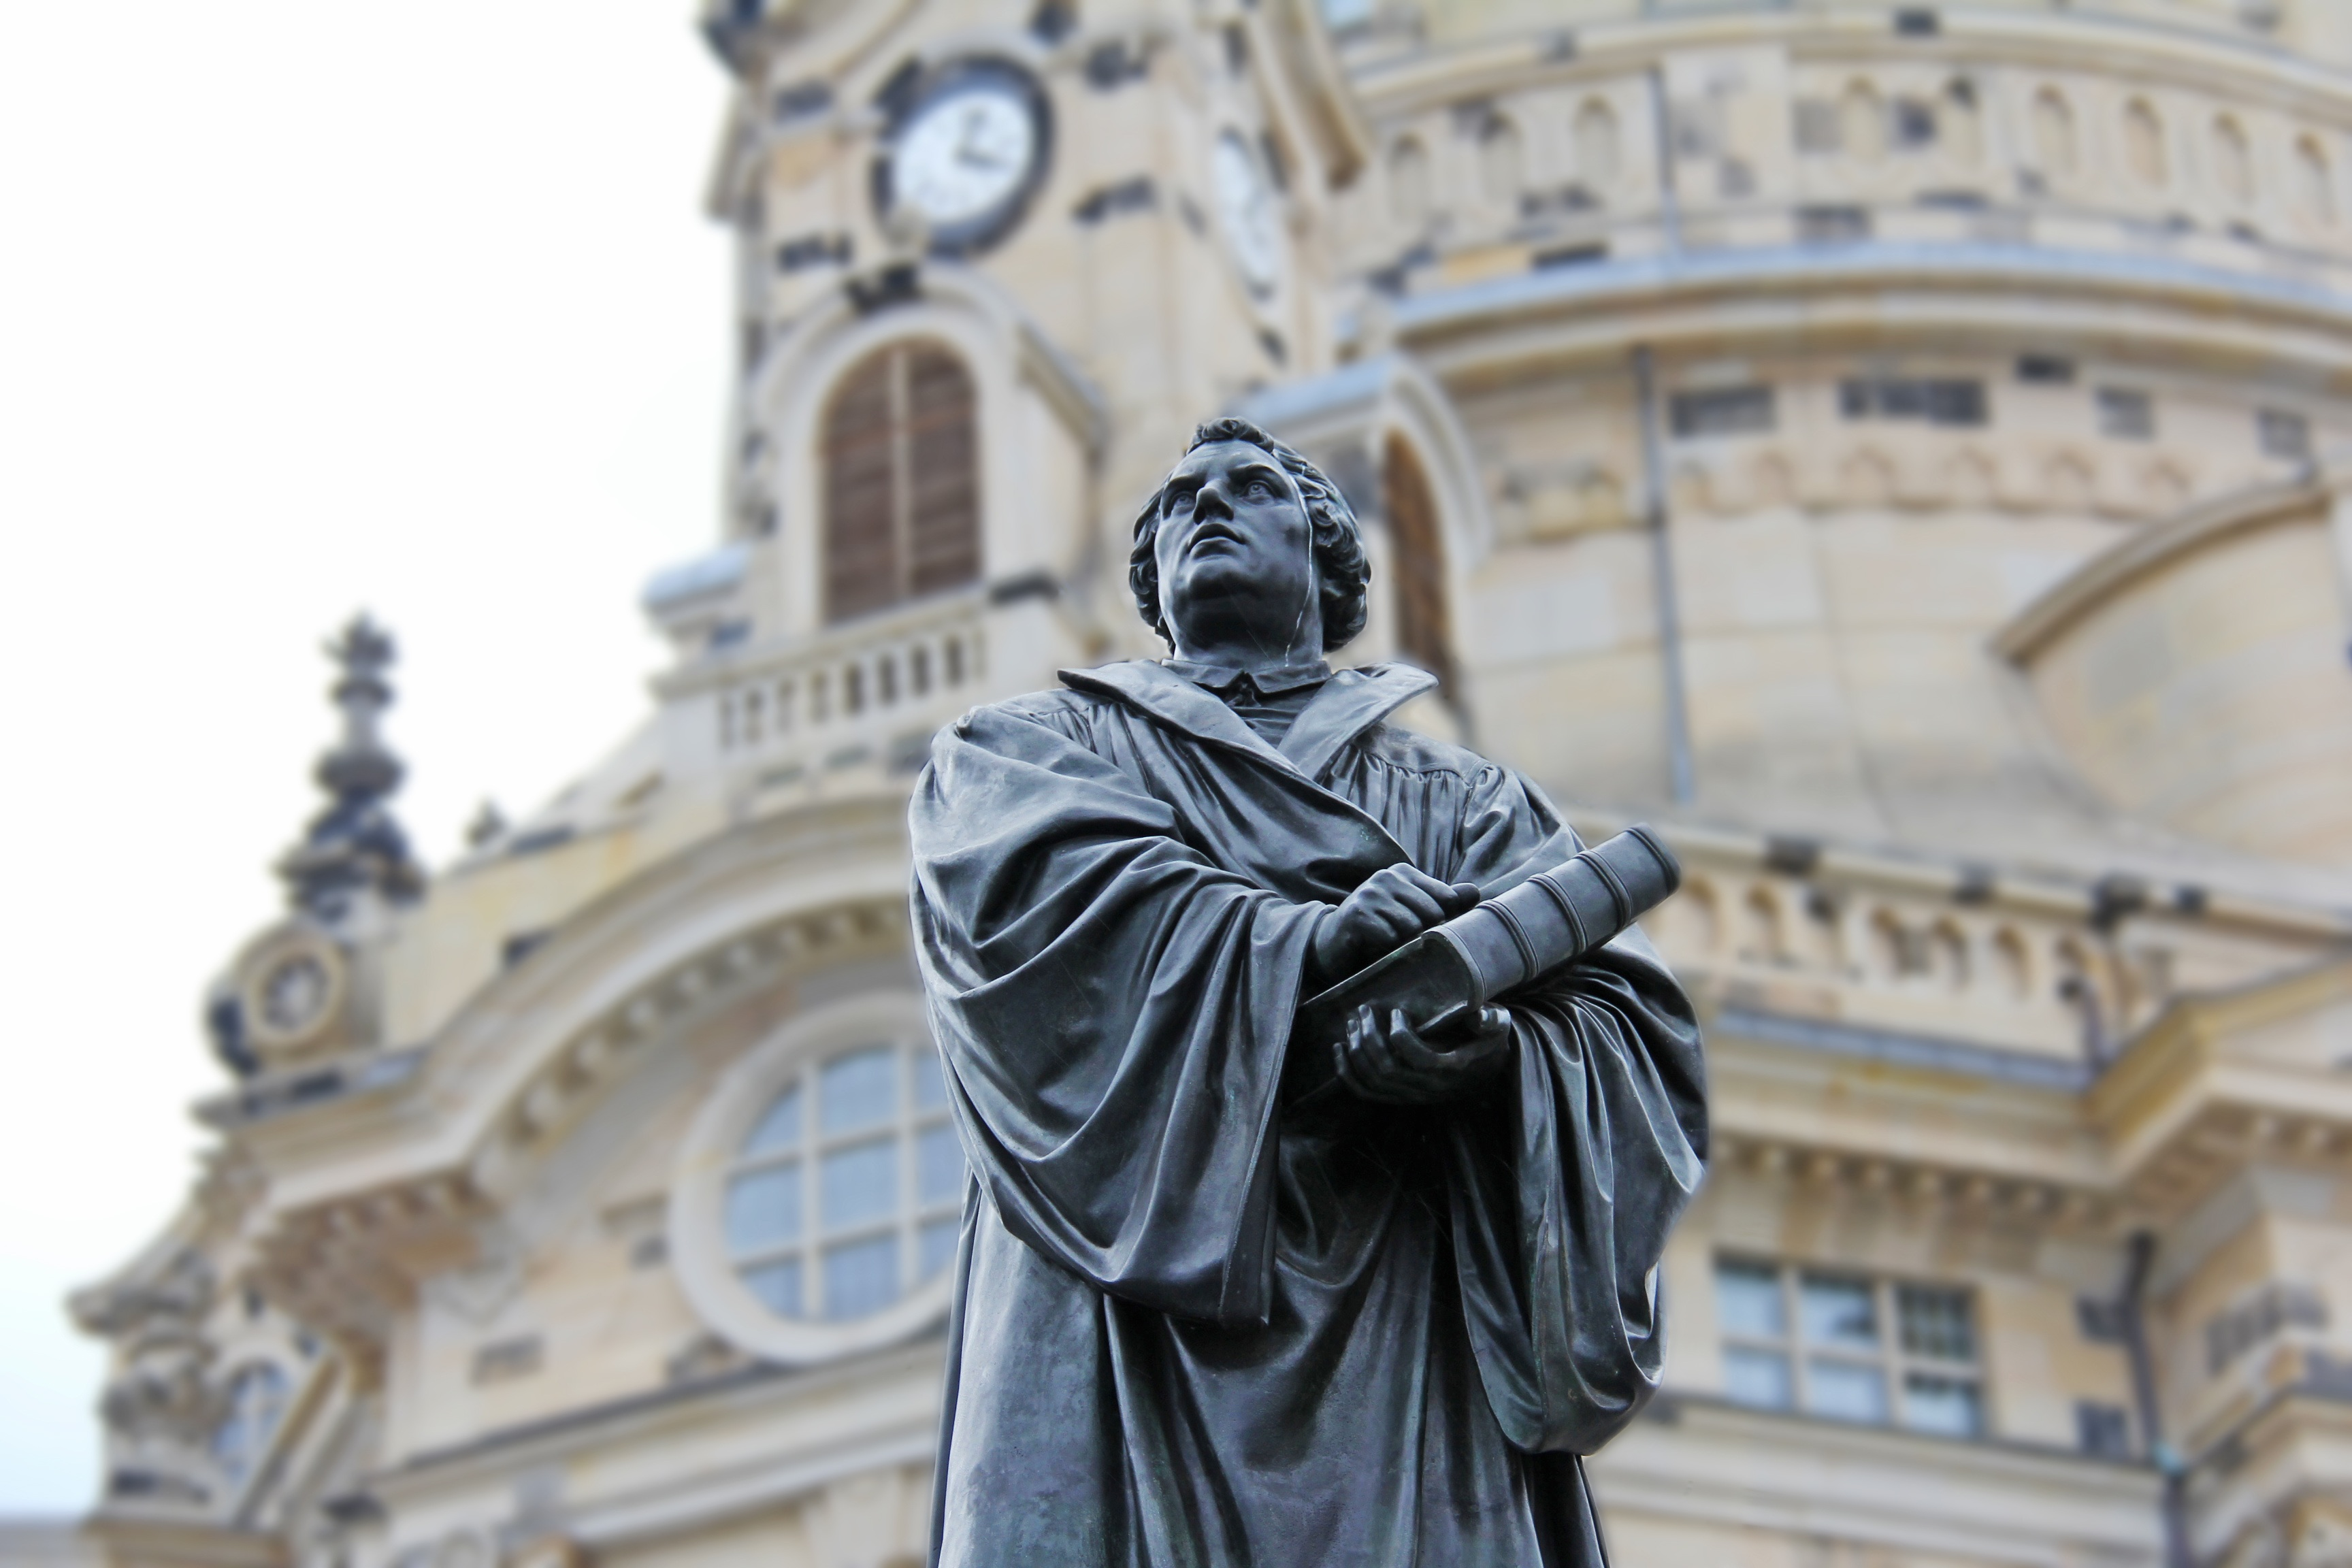 Lutero realmente provocou o secularismo?